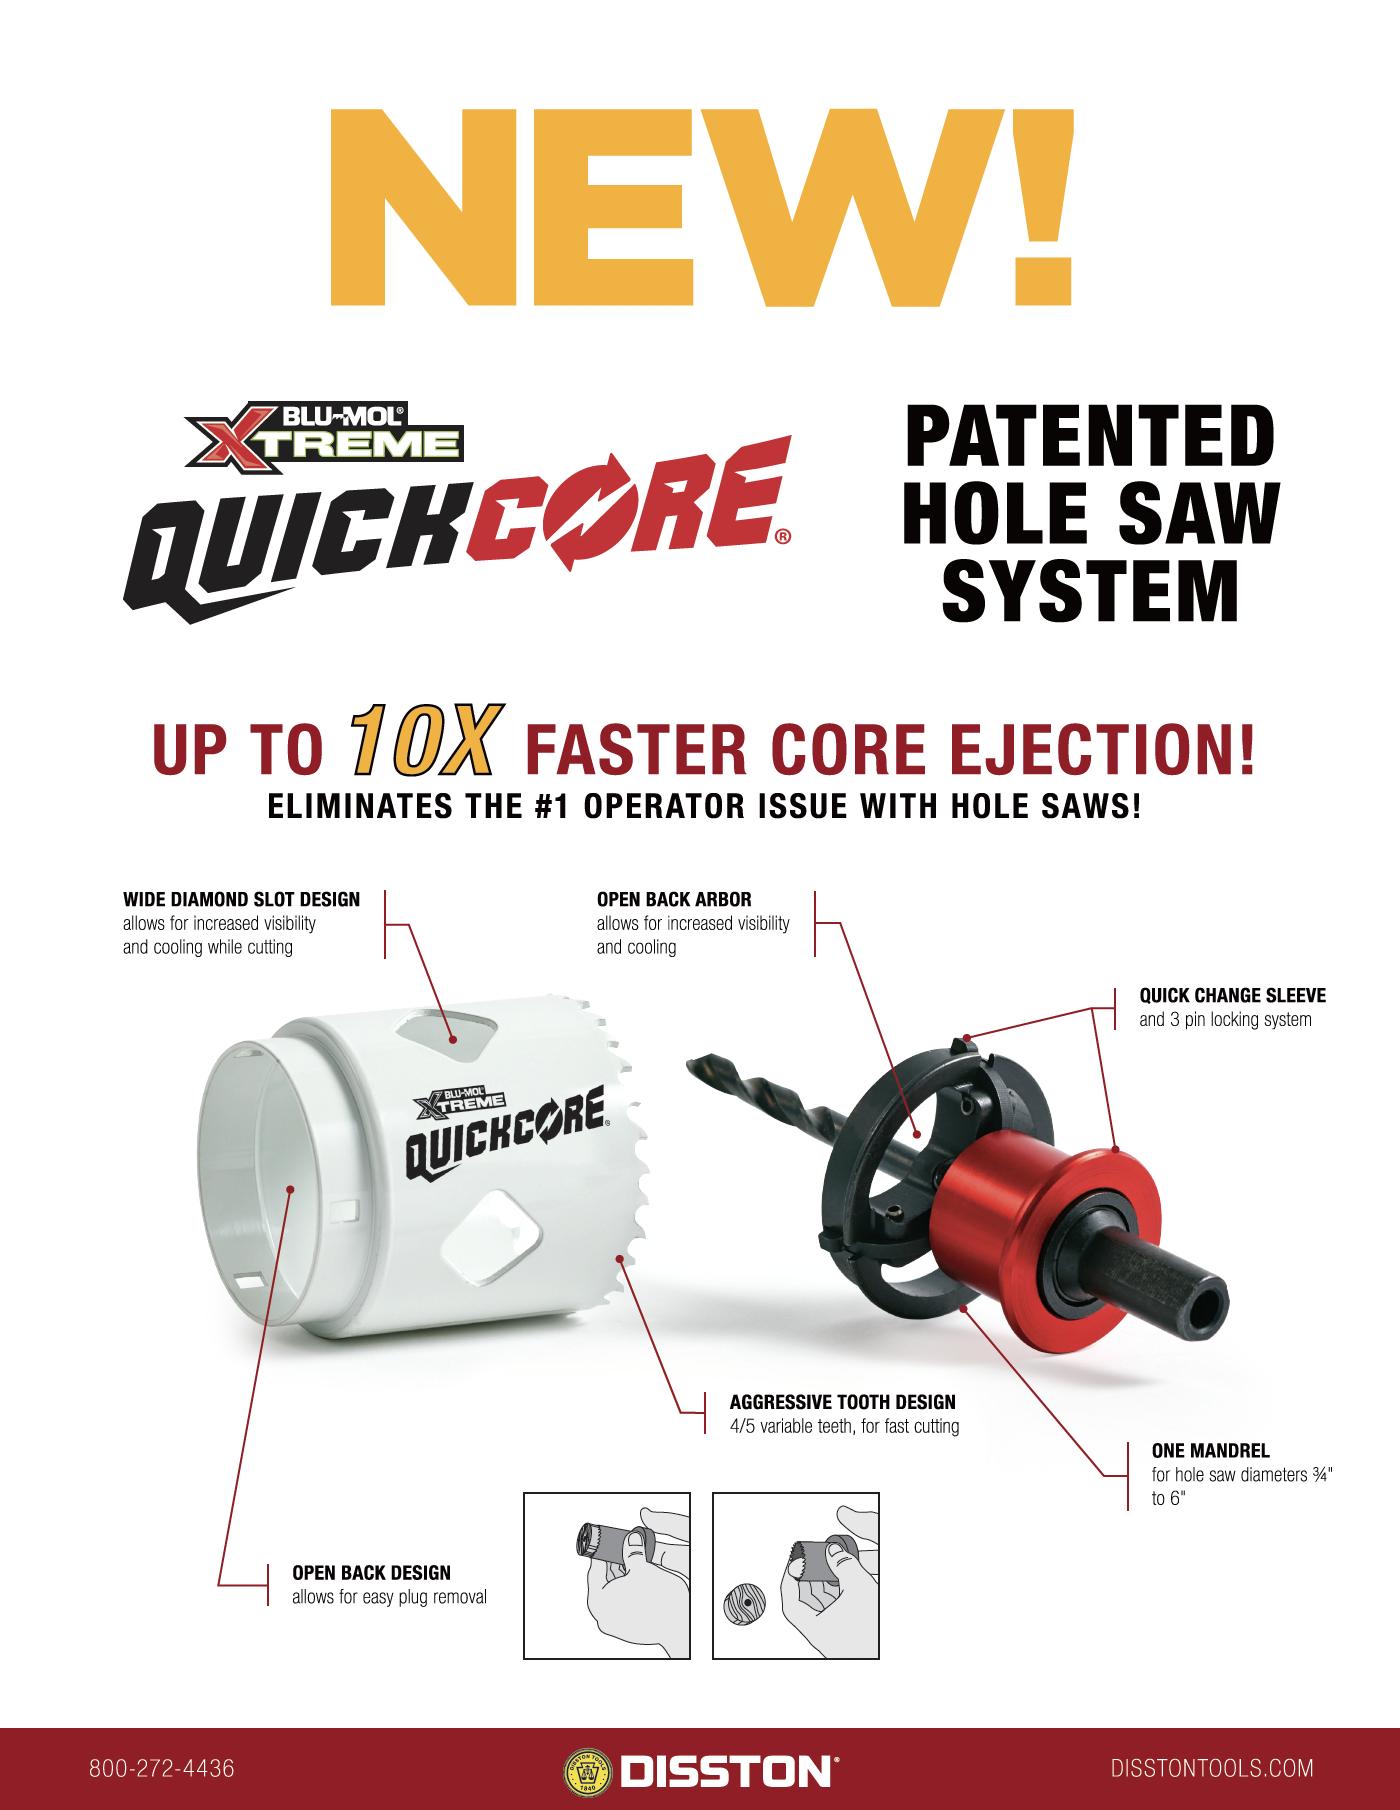 Blu-Mol Xtreme QuickCore